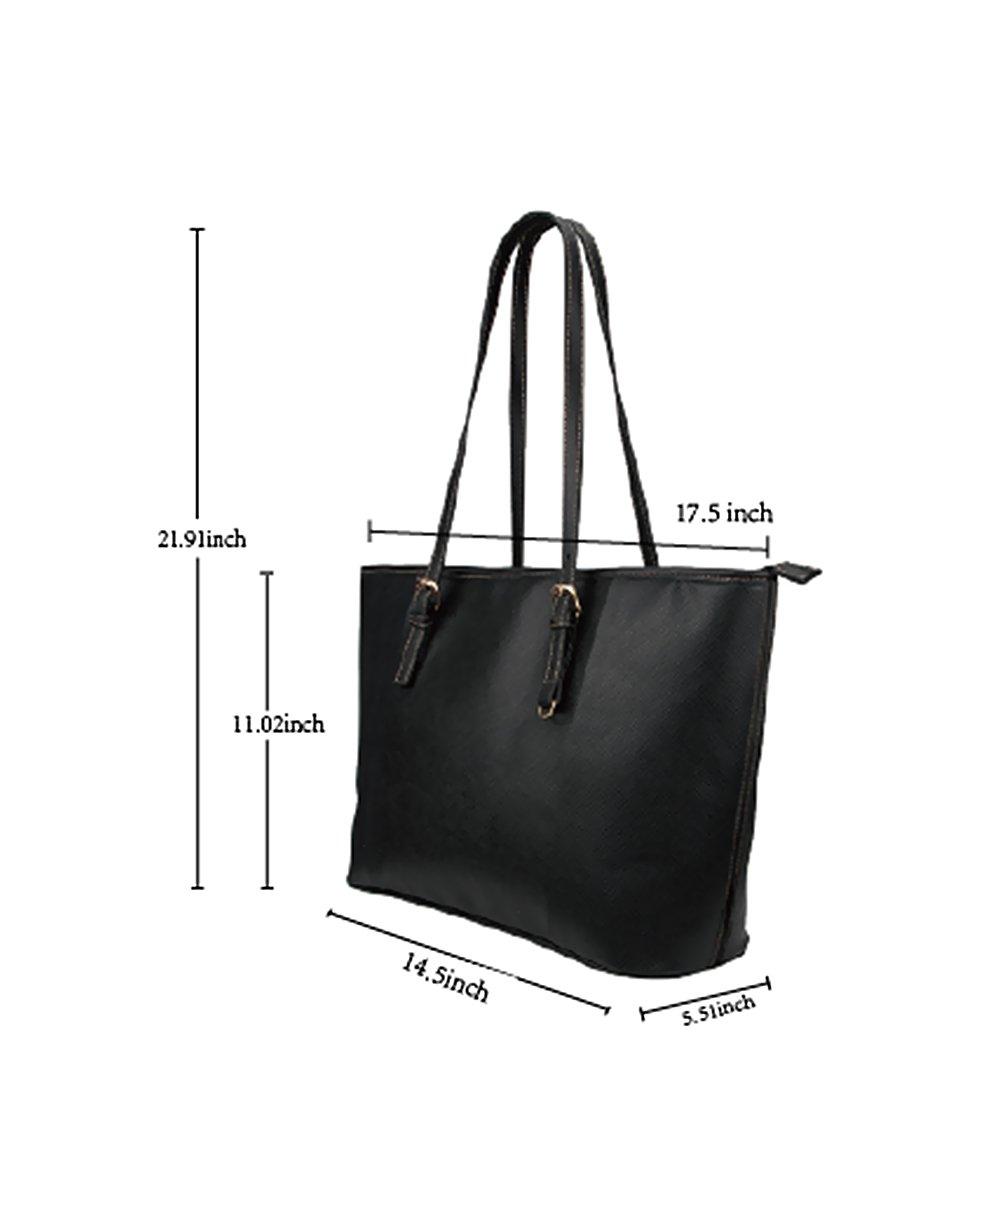 InterestPrint Fashion I Love Paris Eiffel Tower France Women's Leather Handbags Ladies Shoulder Bag Tote Bags by InterestPrint (Image #5)